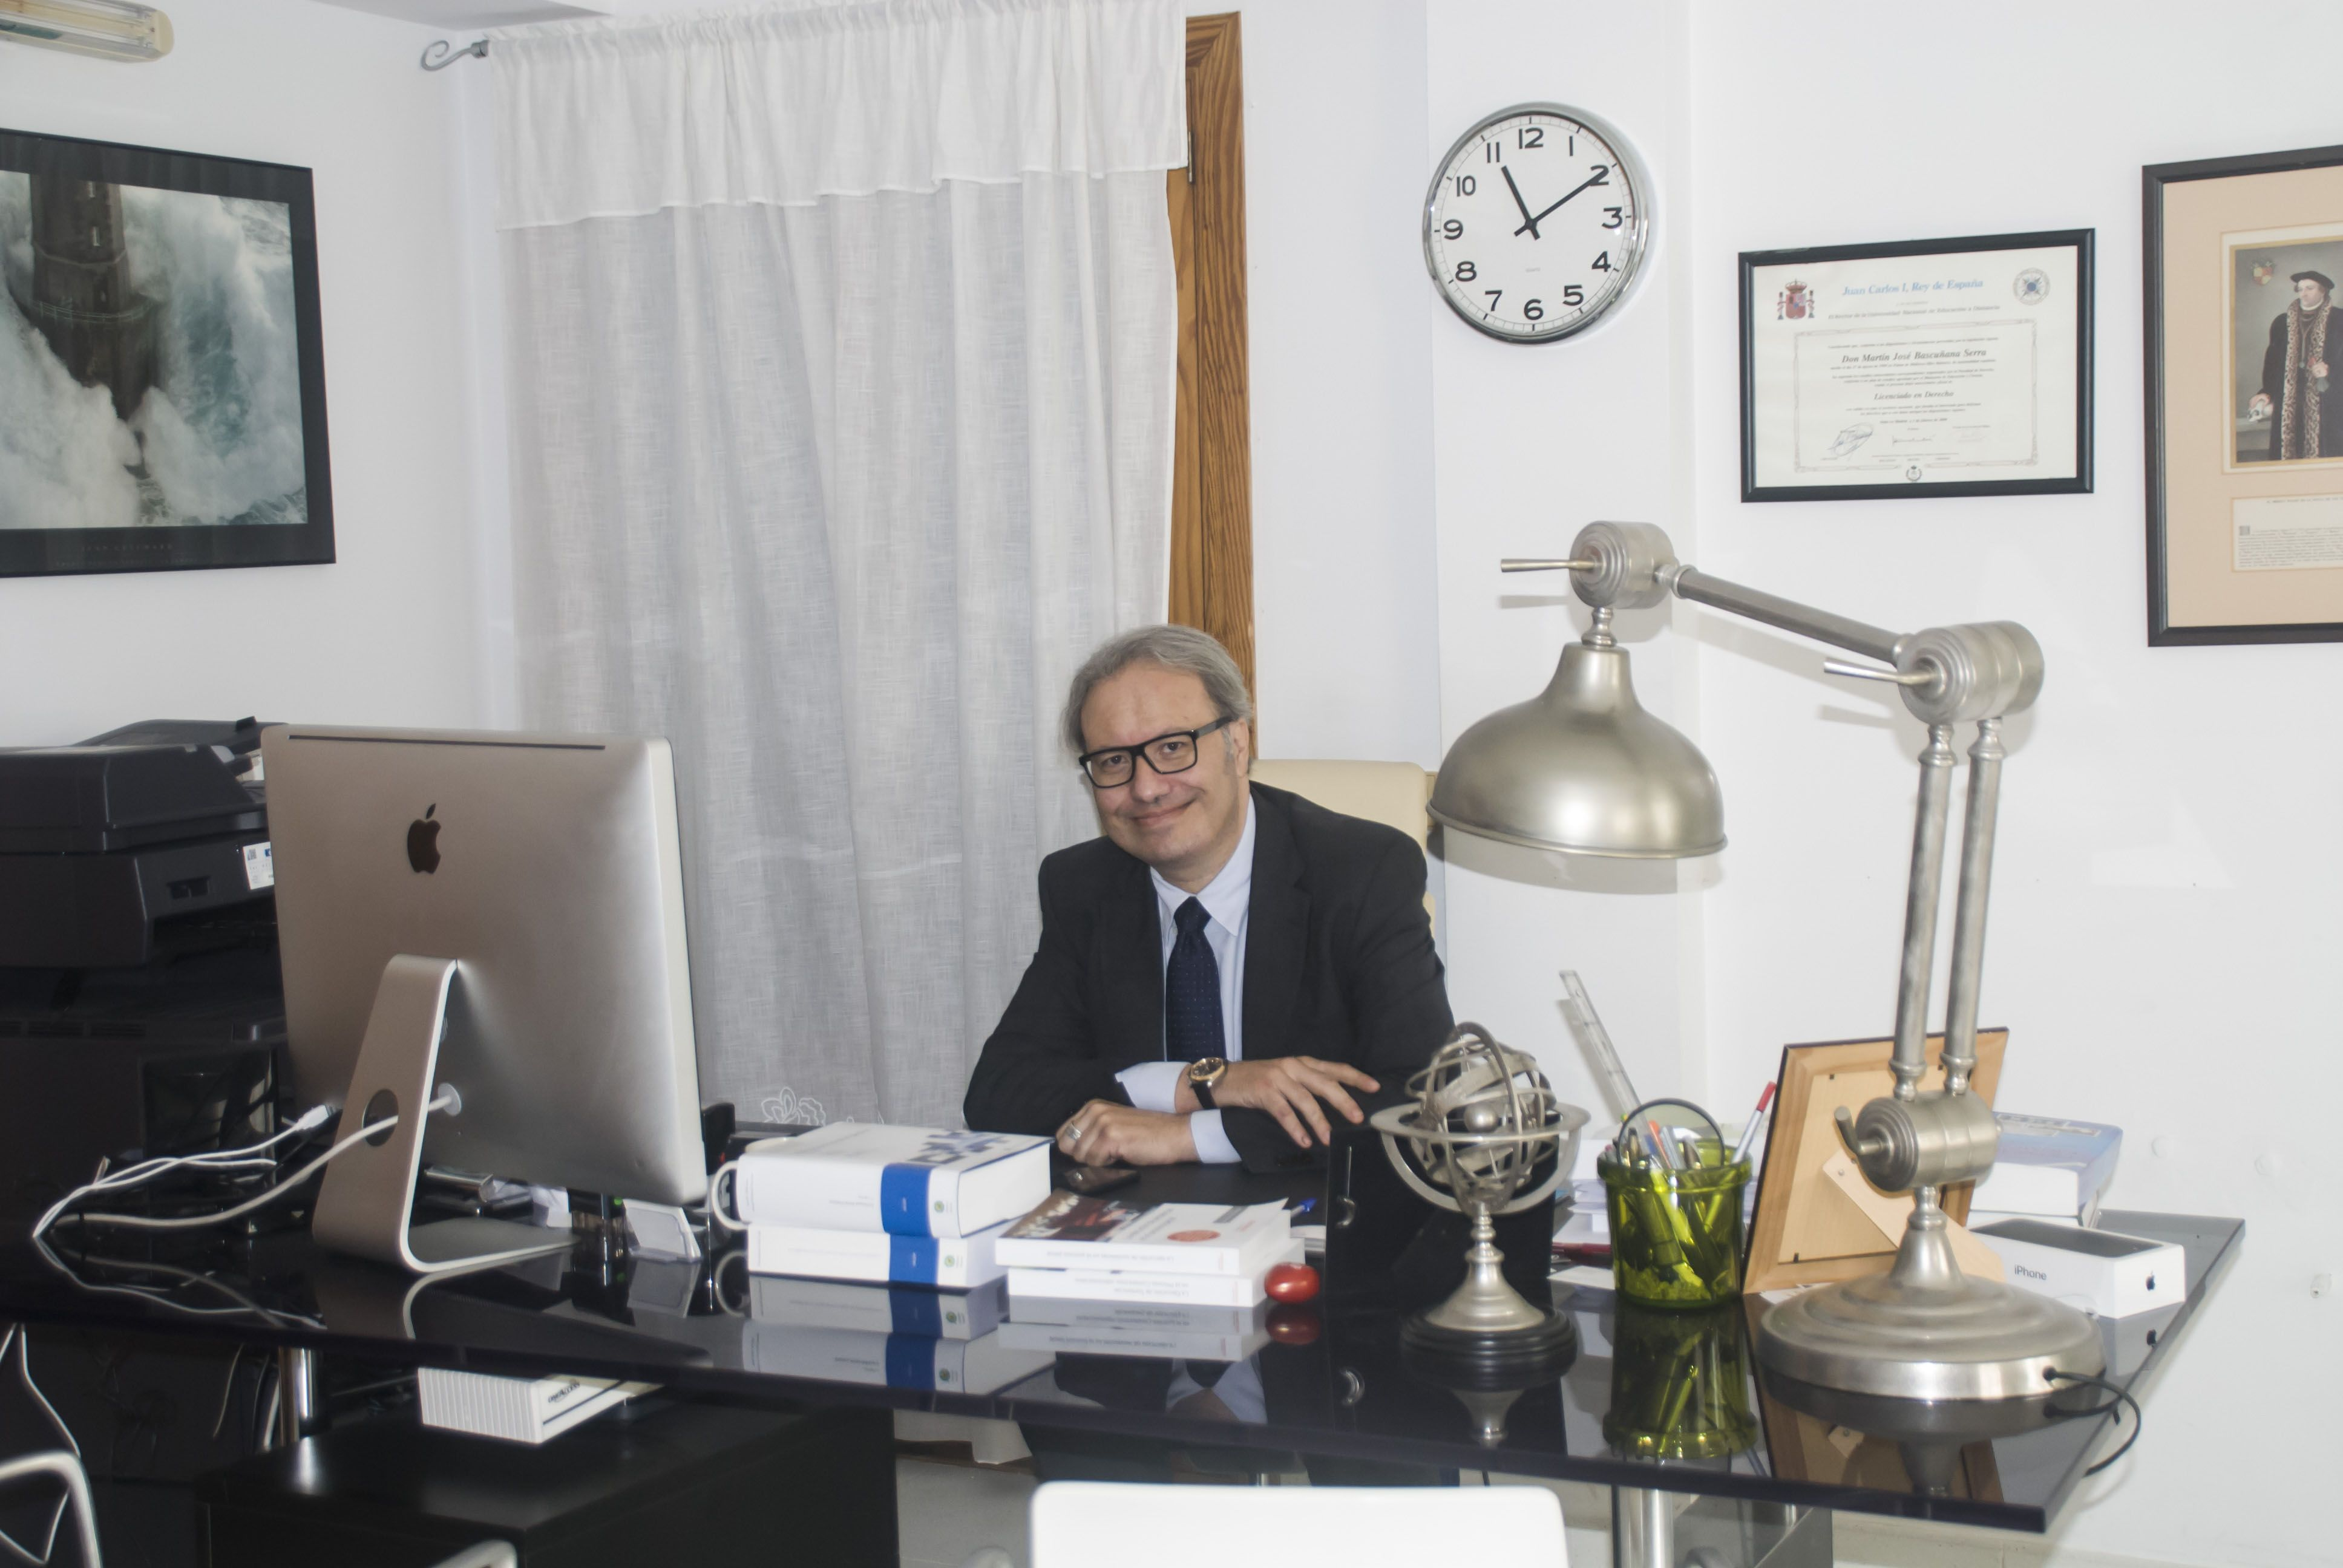 Derecho civil en Baleares